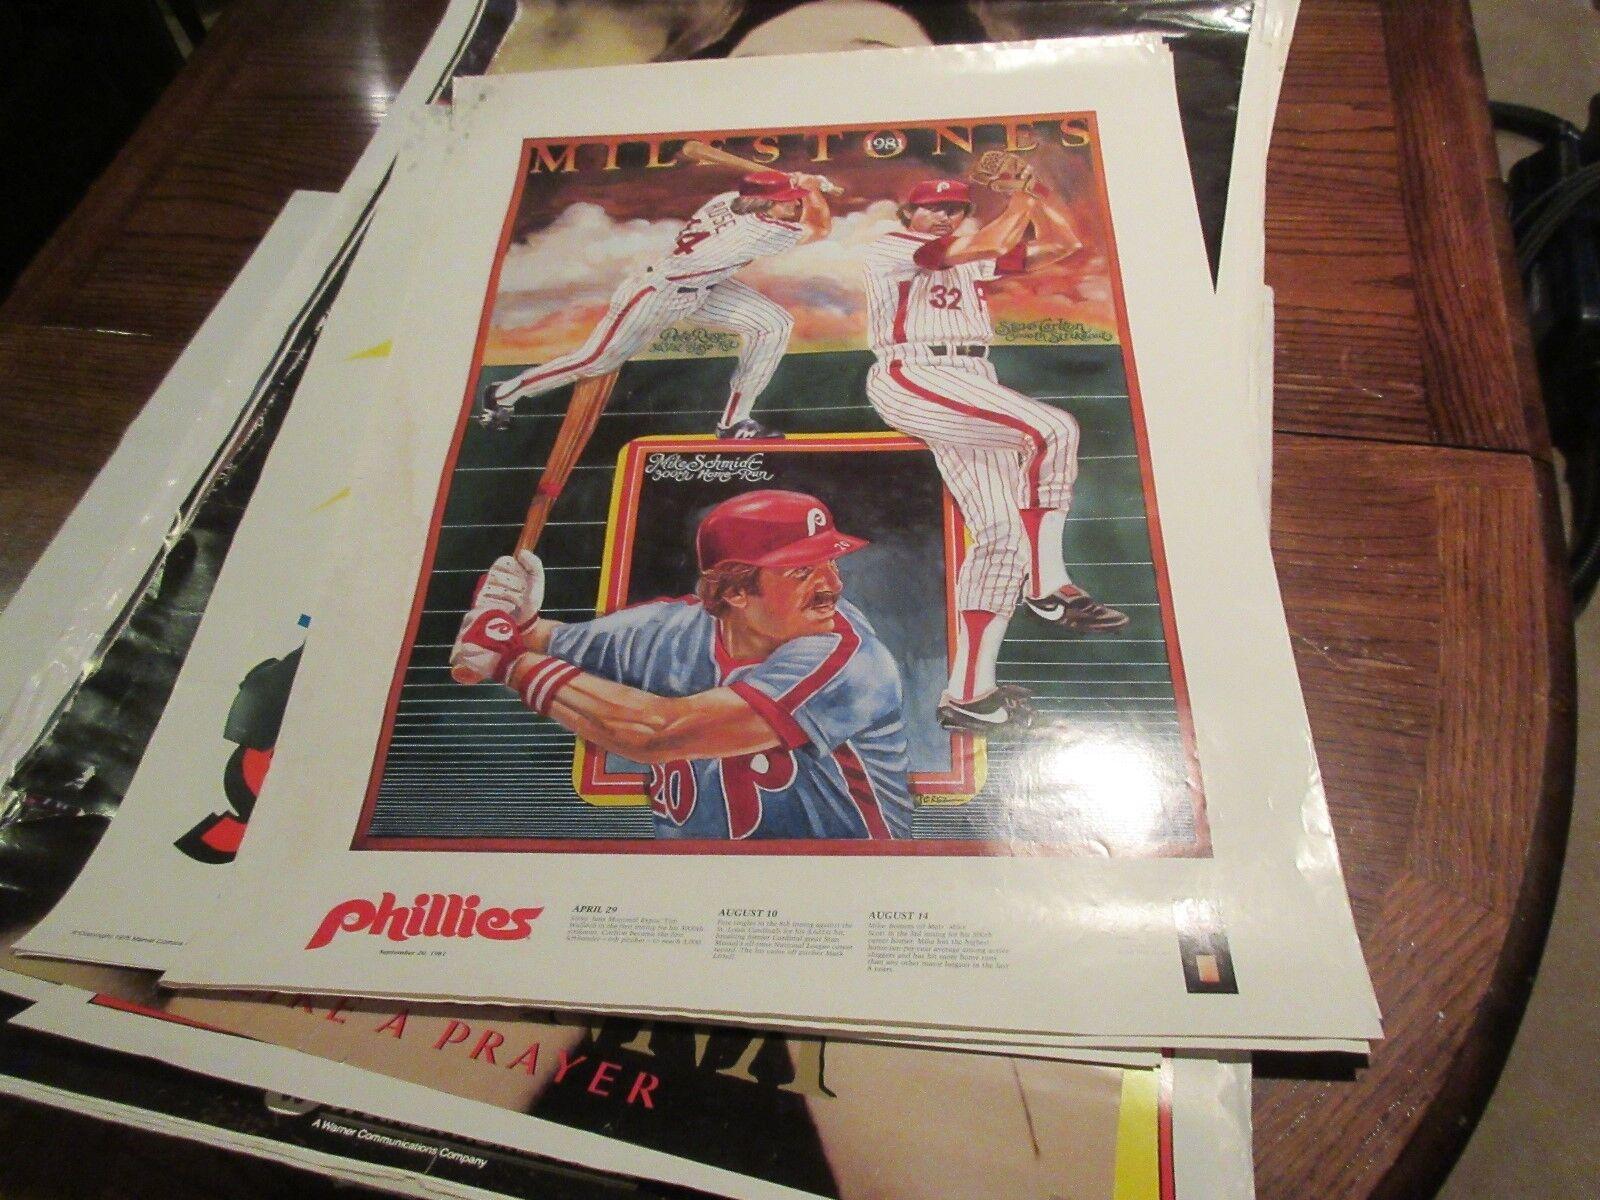 Philadelphia Phillies , Milestones , 1981 , Rolaids POS